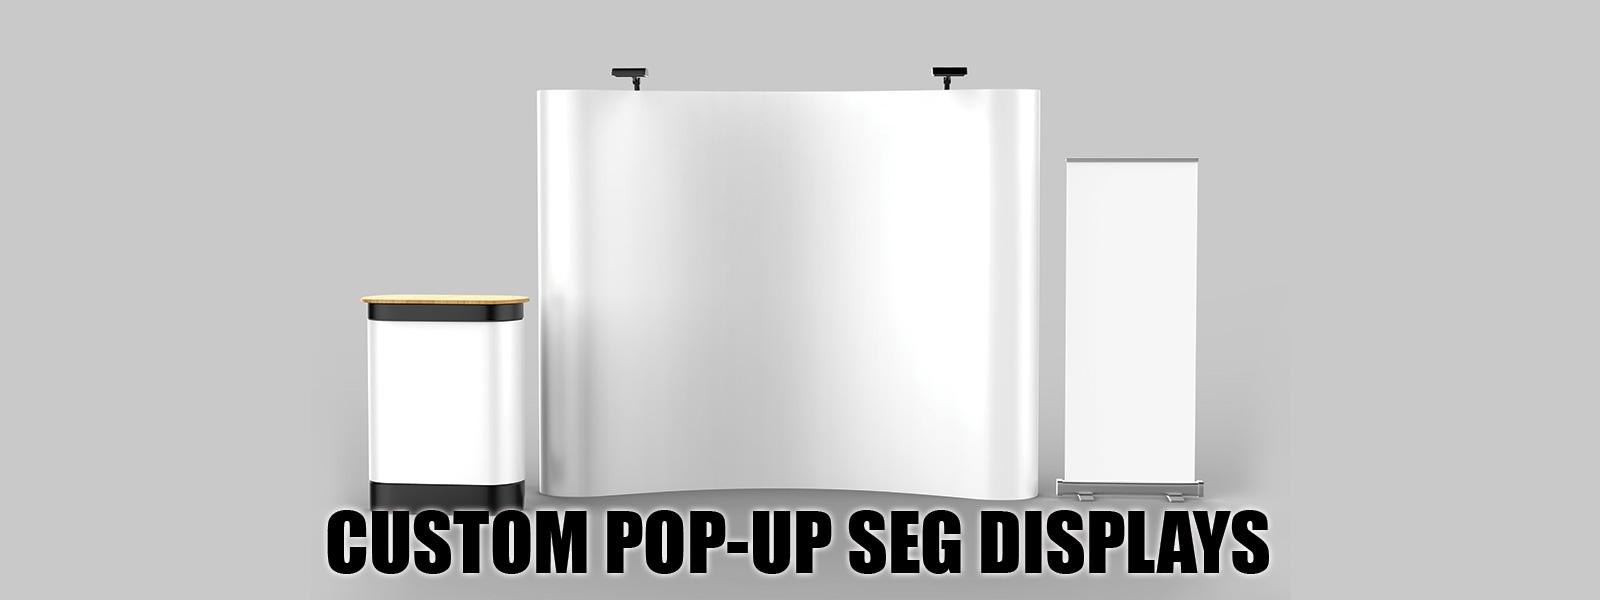 Custom Pop Up SEG Displays